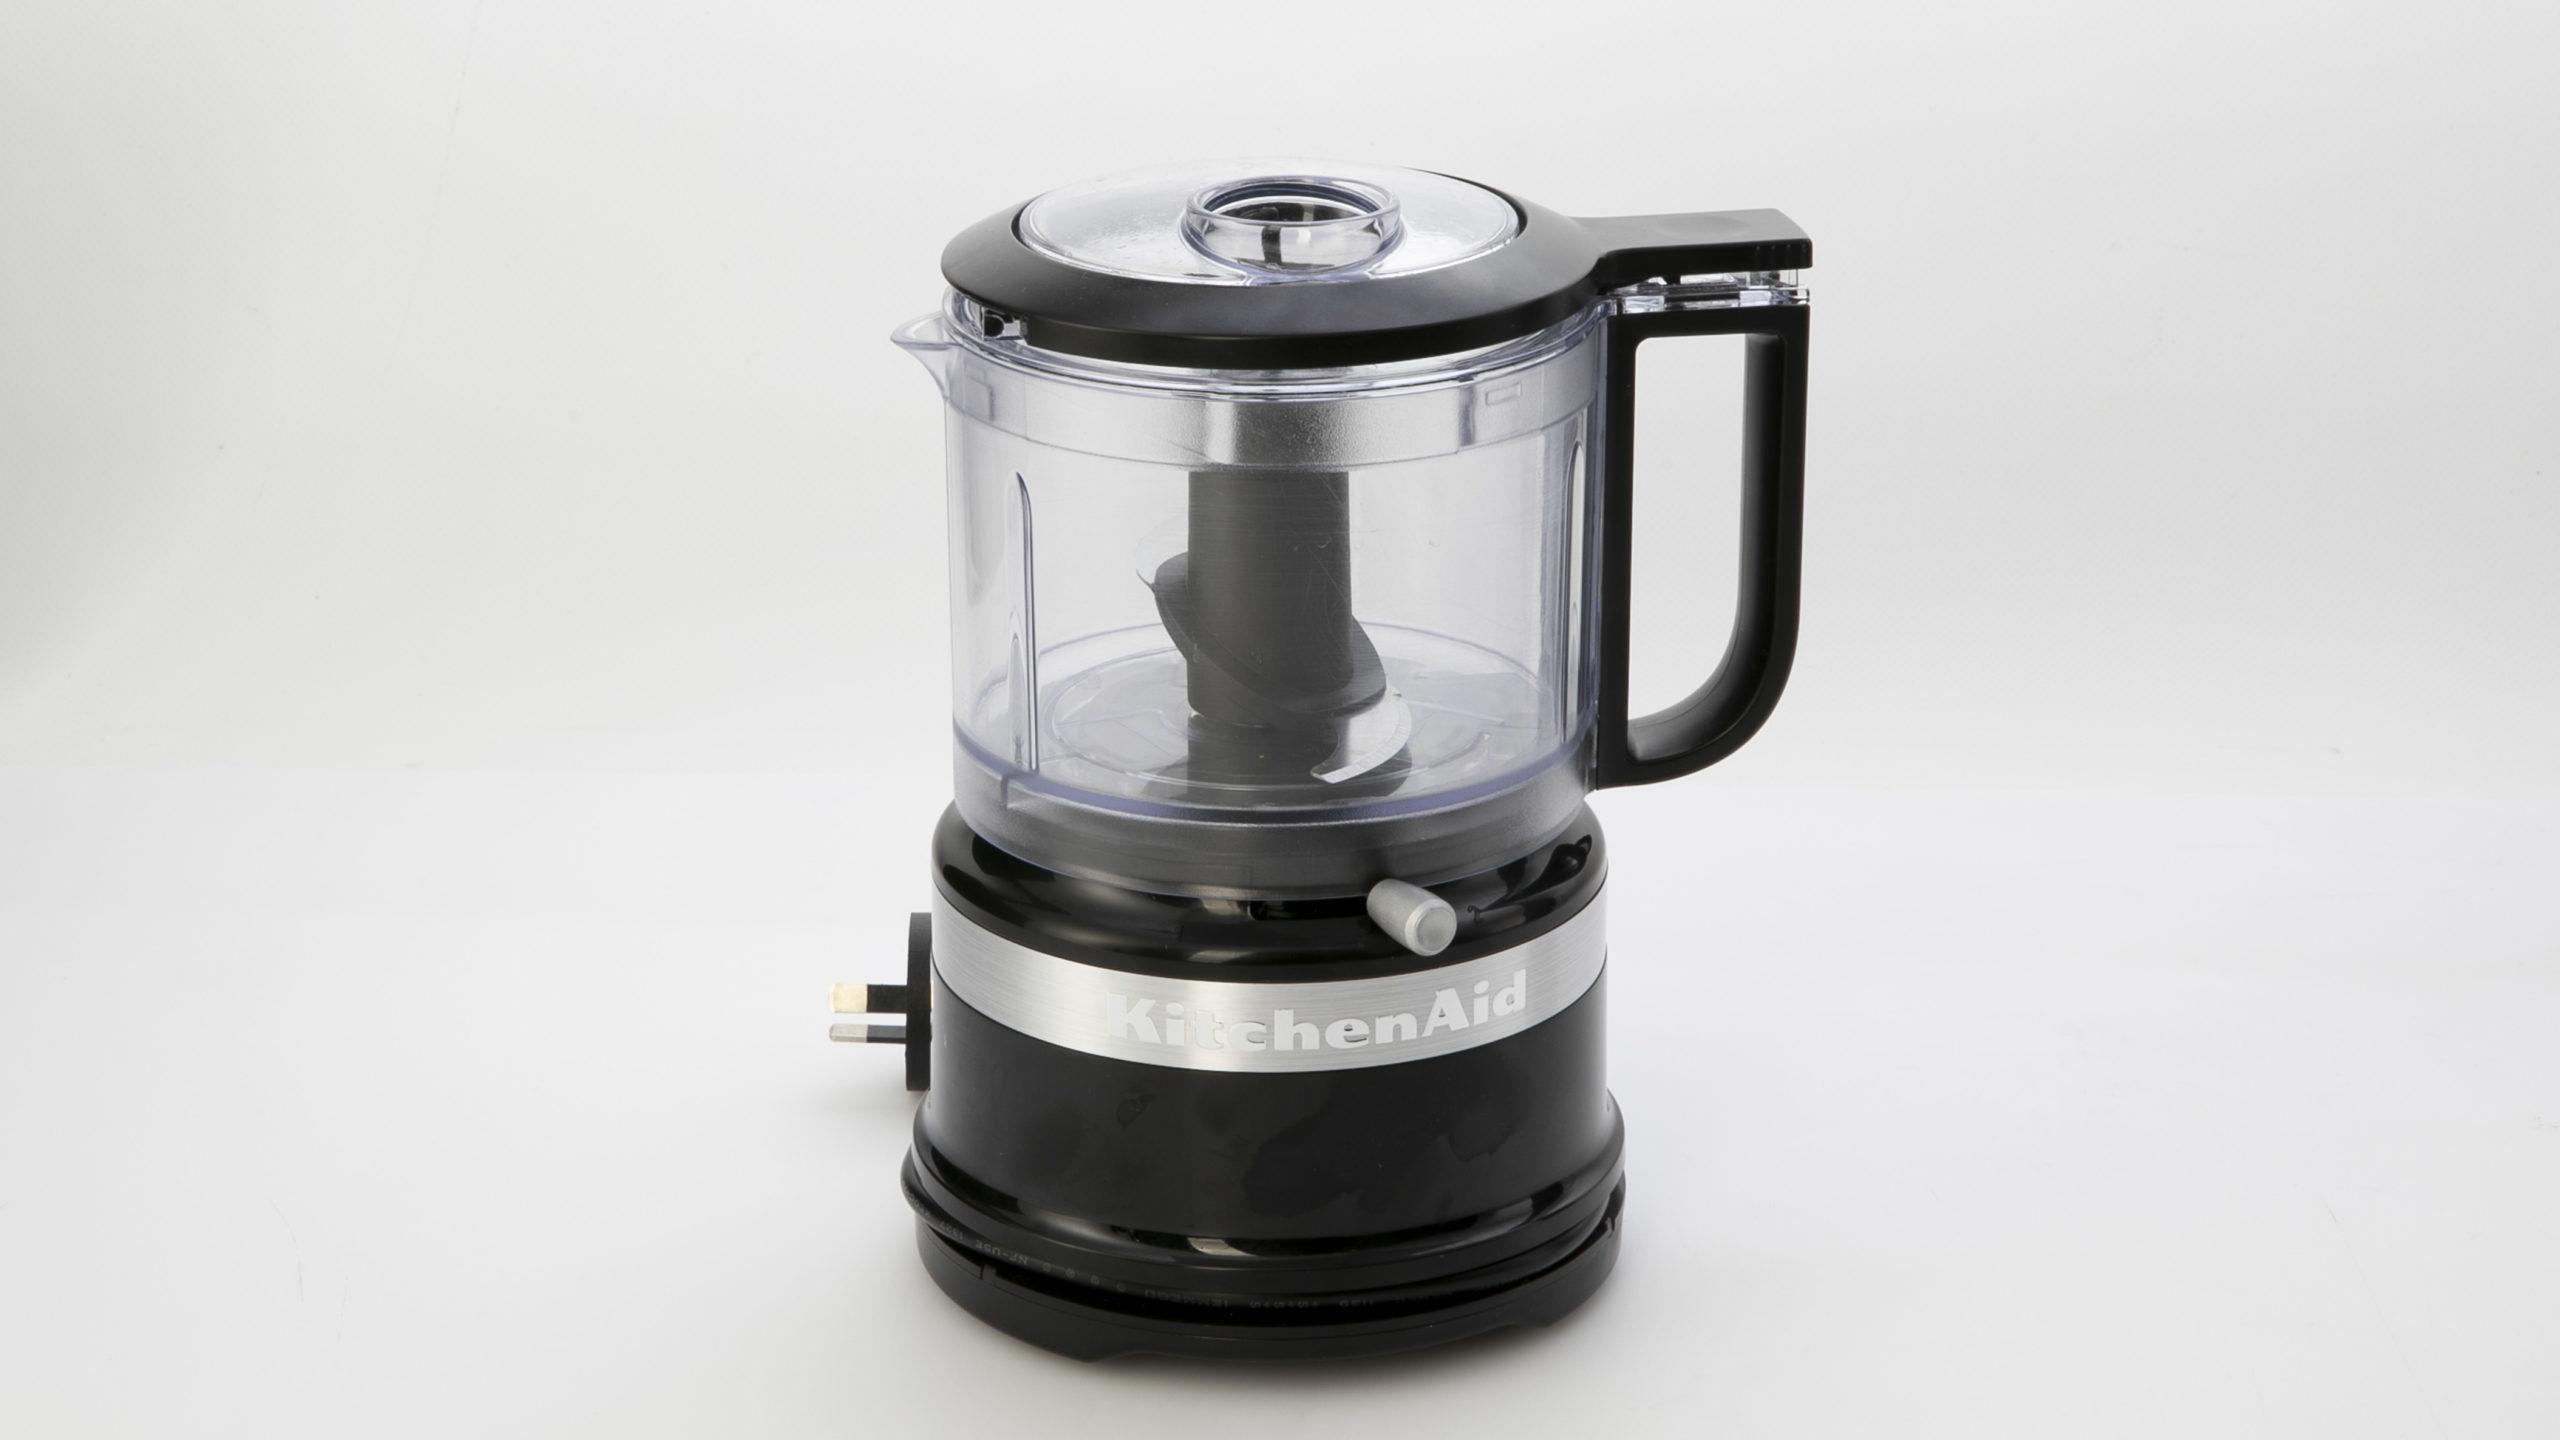 KitchenAid's 3.5 Cup Food Chopper